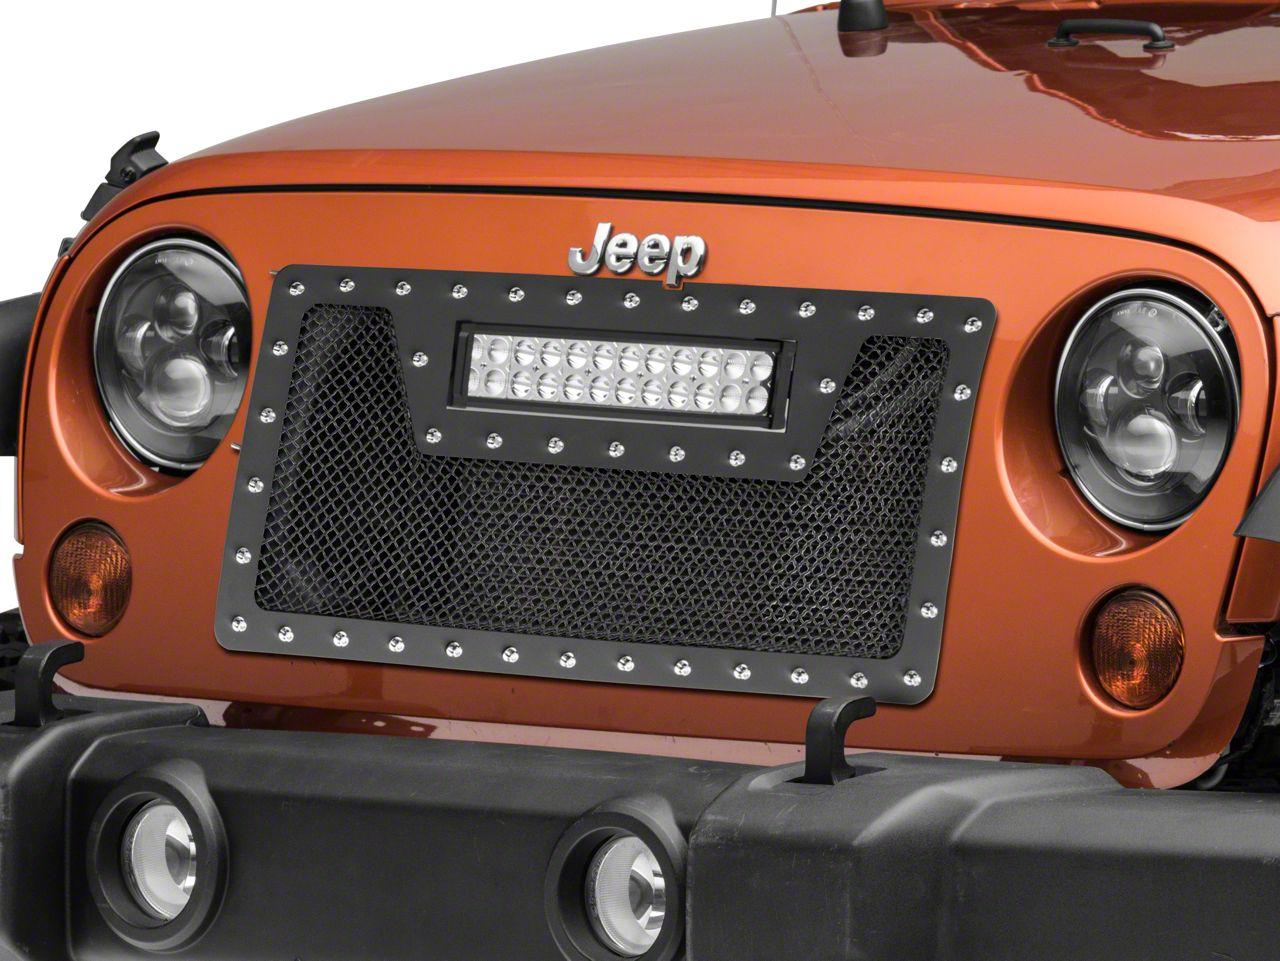 Wire Mesh Cutout Grille w/ Rivets & LED Light Bar - Black (07-18 Jeep Wrangler JK)